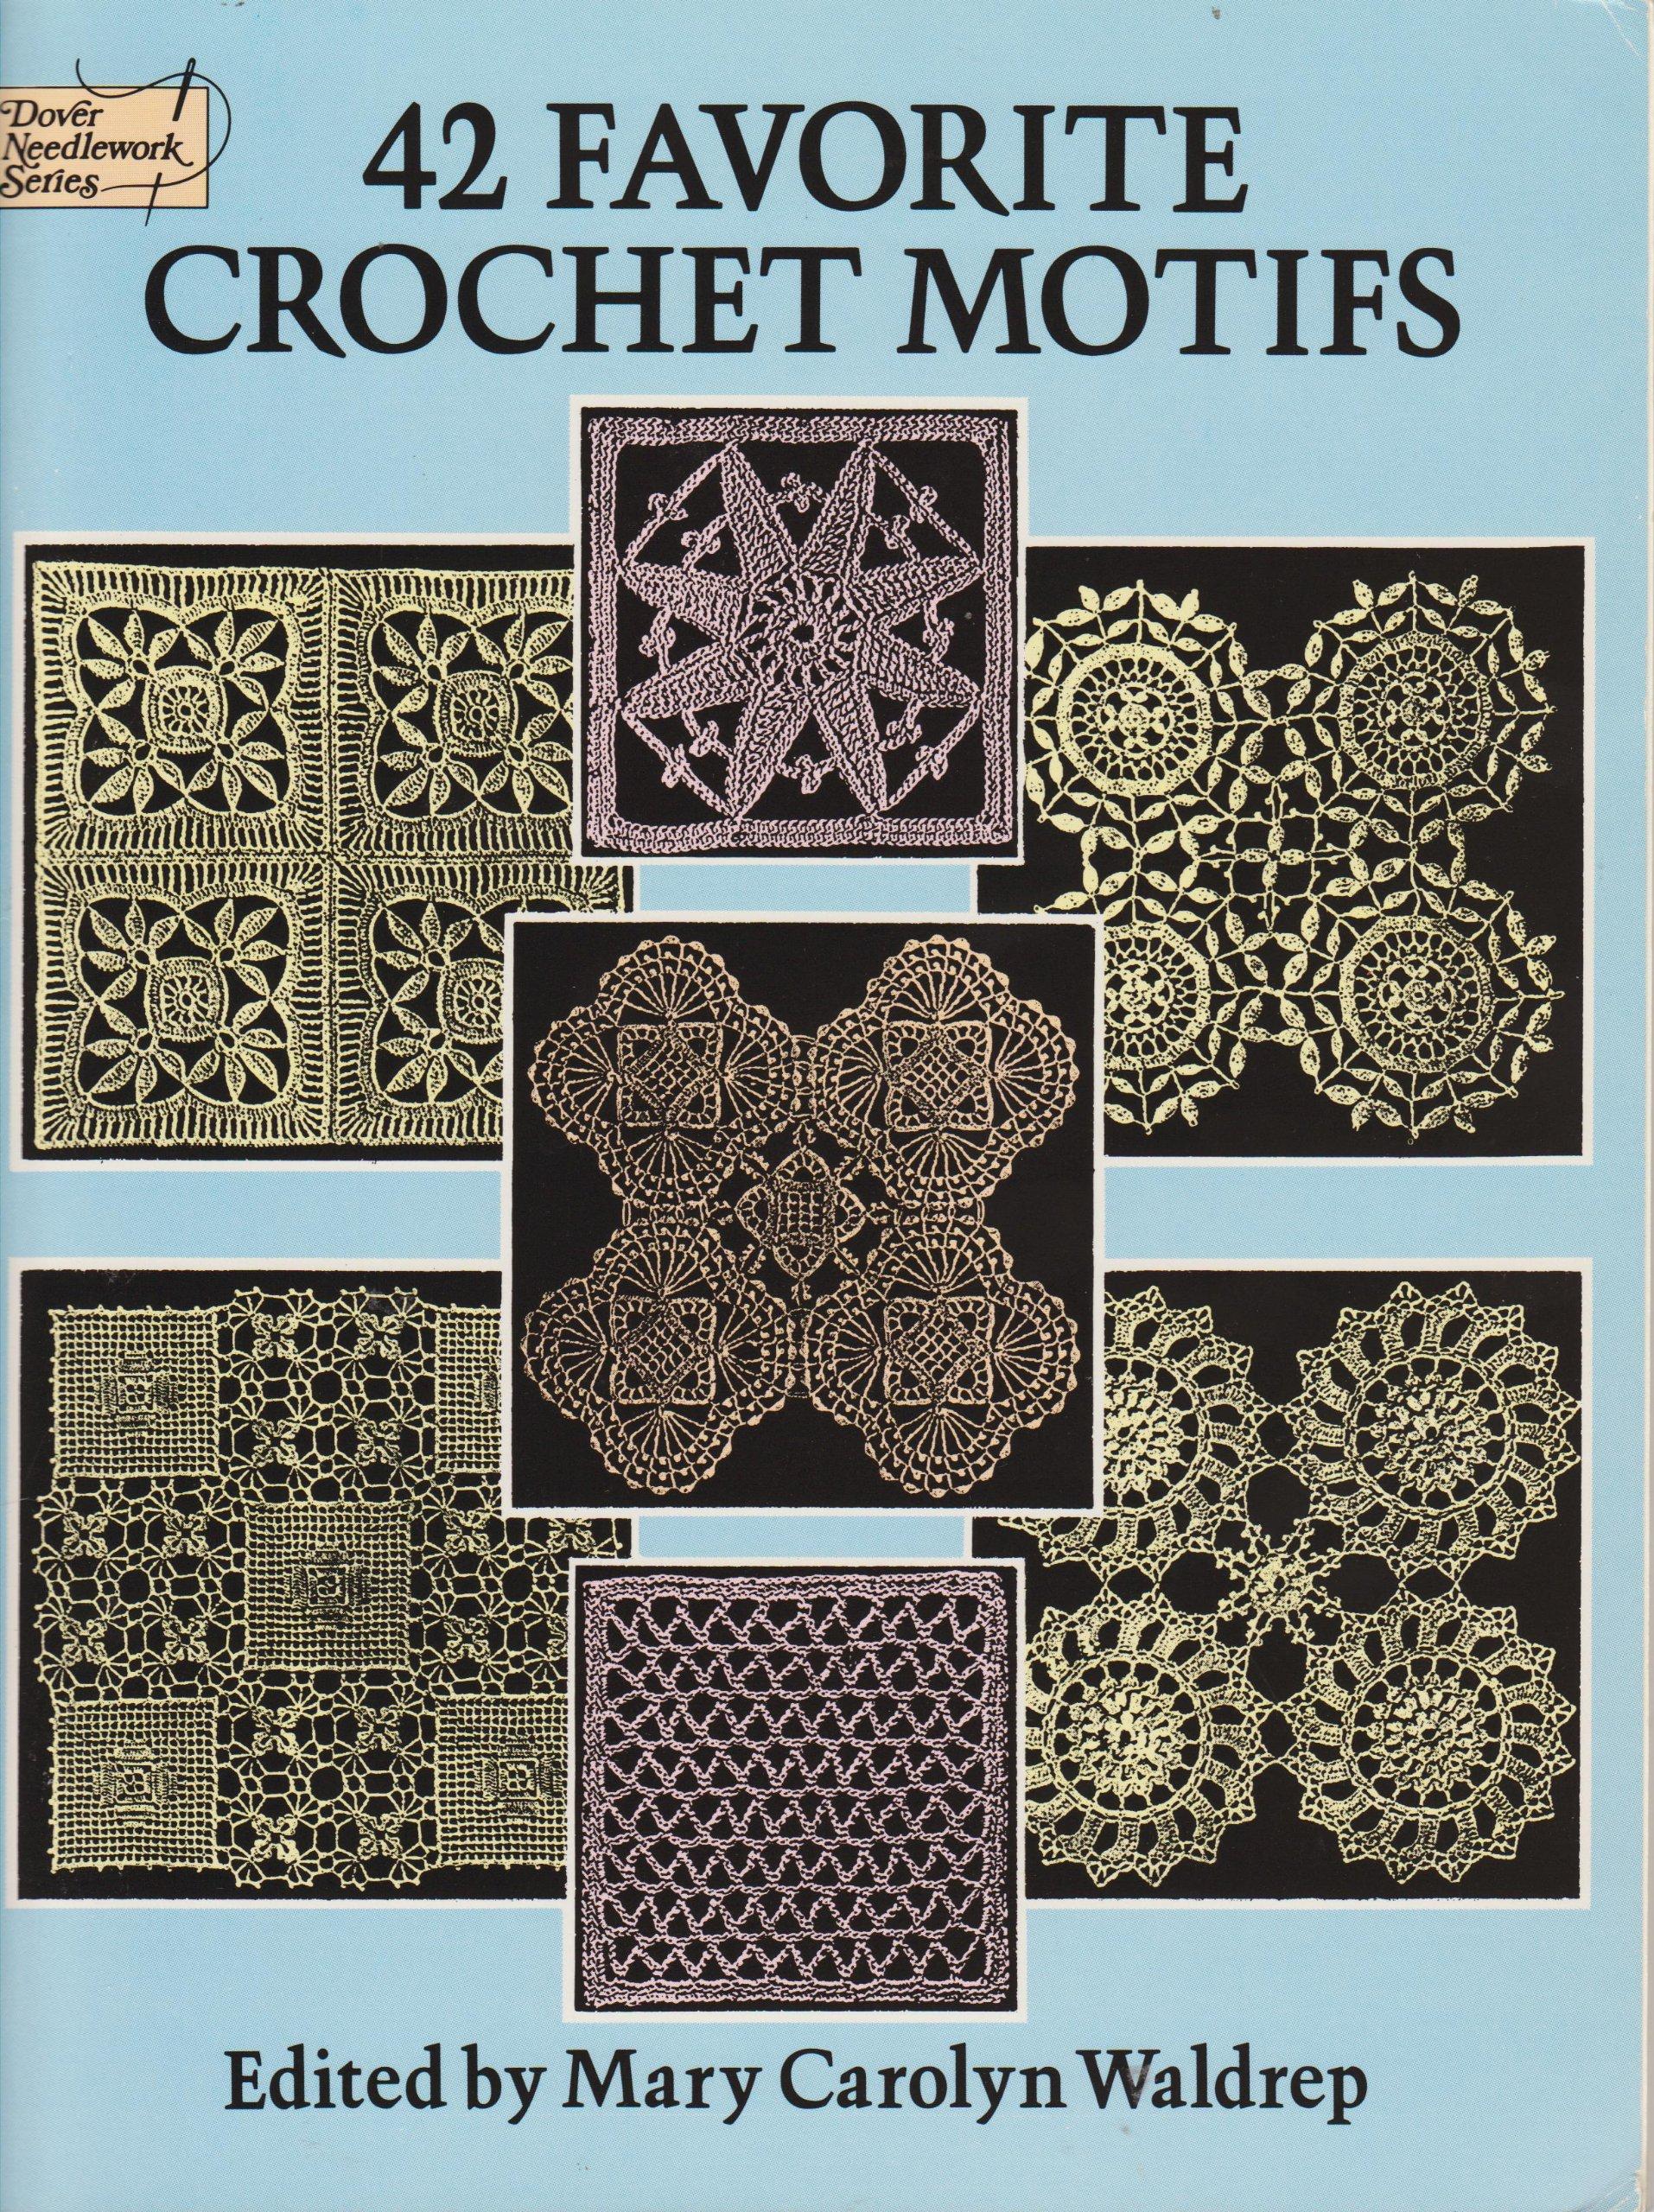 42 Favorite Crochet Motifs (Dover Needlework): Mary Carolyn Waldrep:  9780486269566: Amazon.com: Books